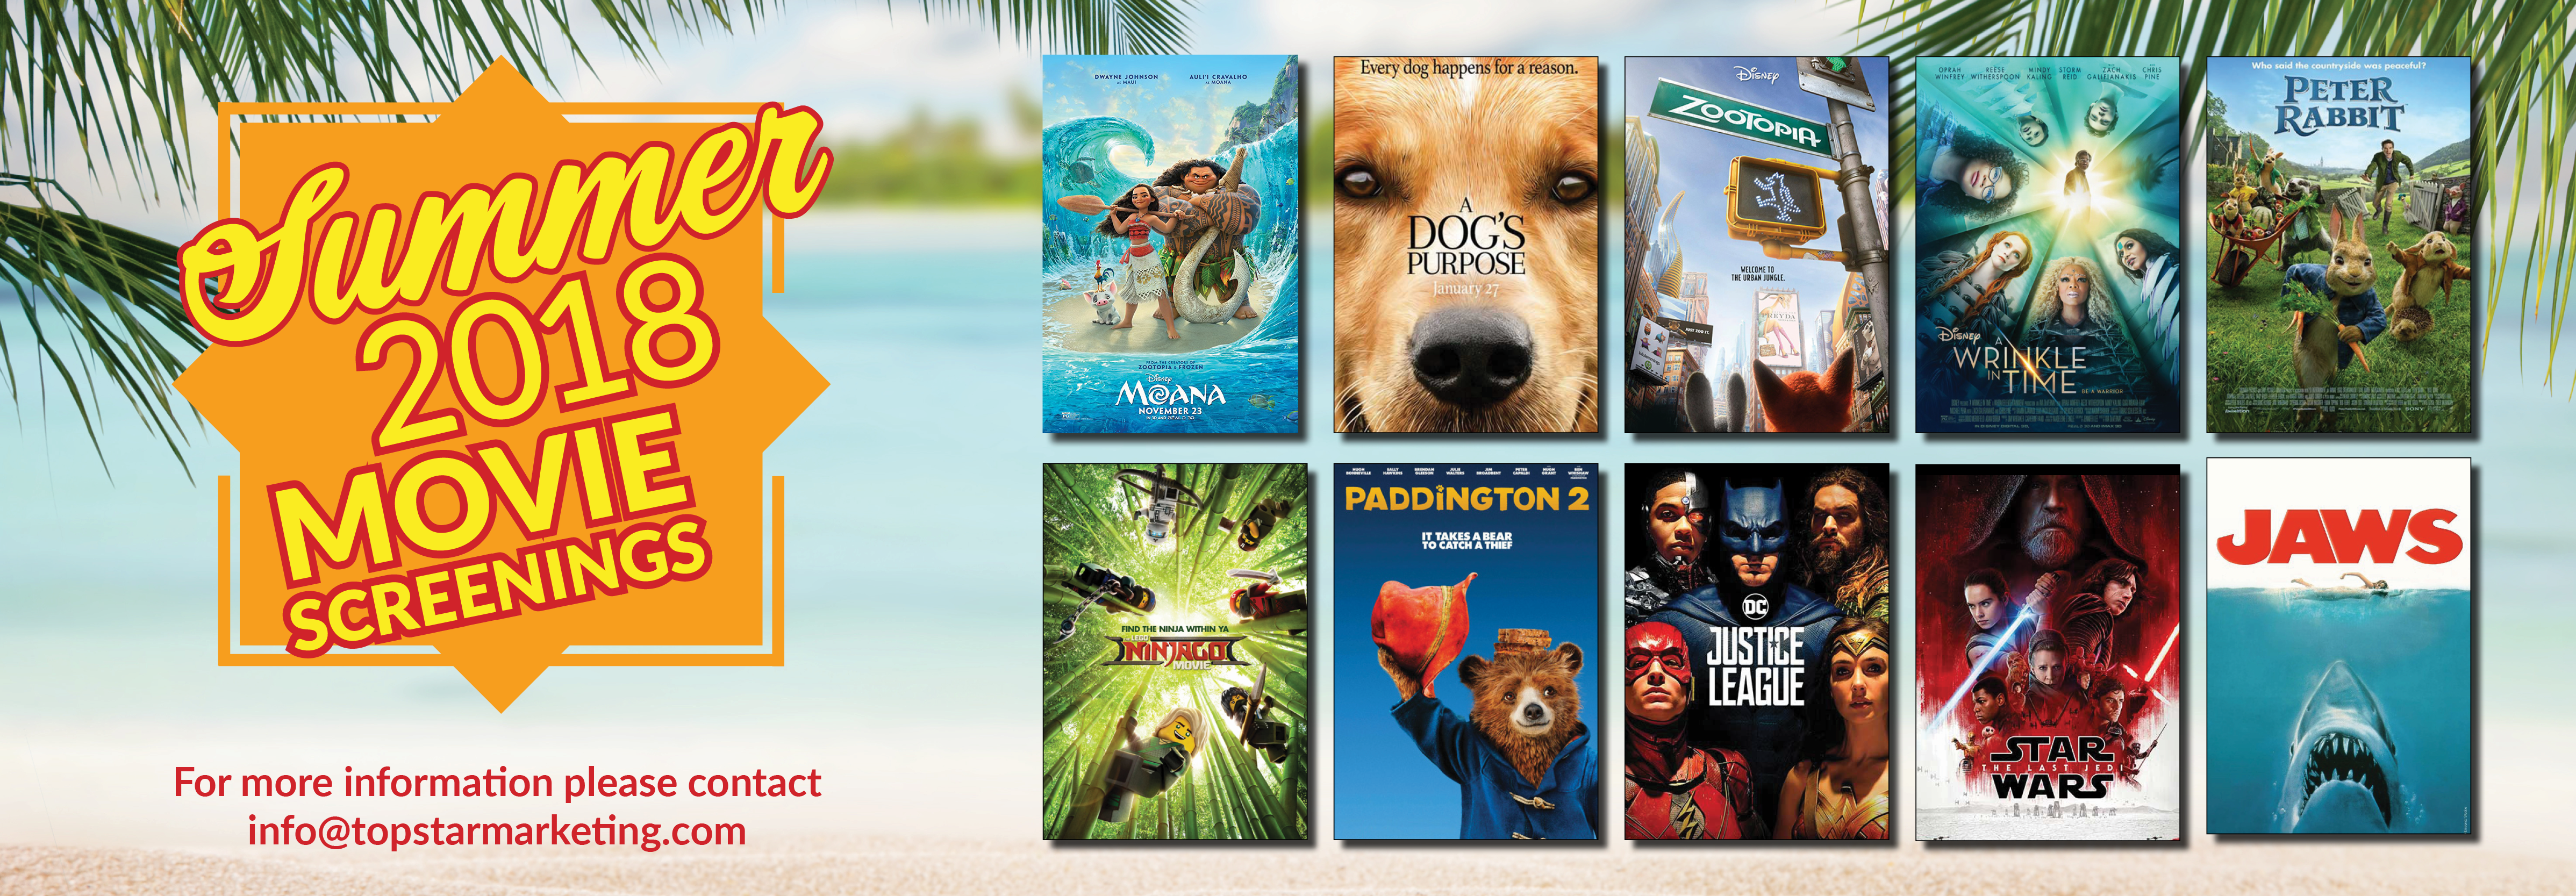 Summer 2018 Movie Screening Website Banner 1150x400